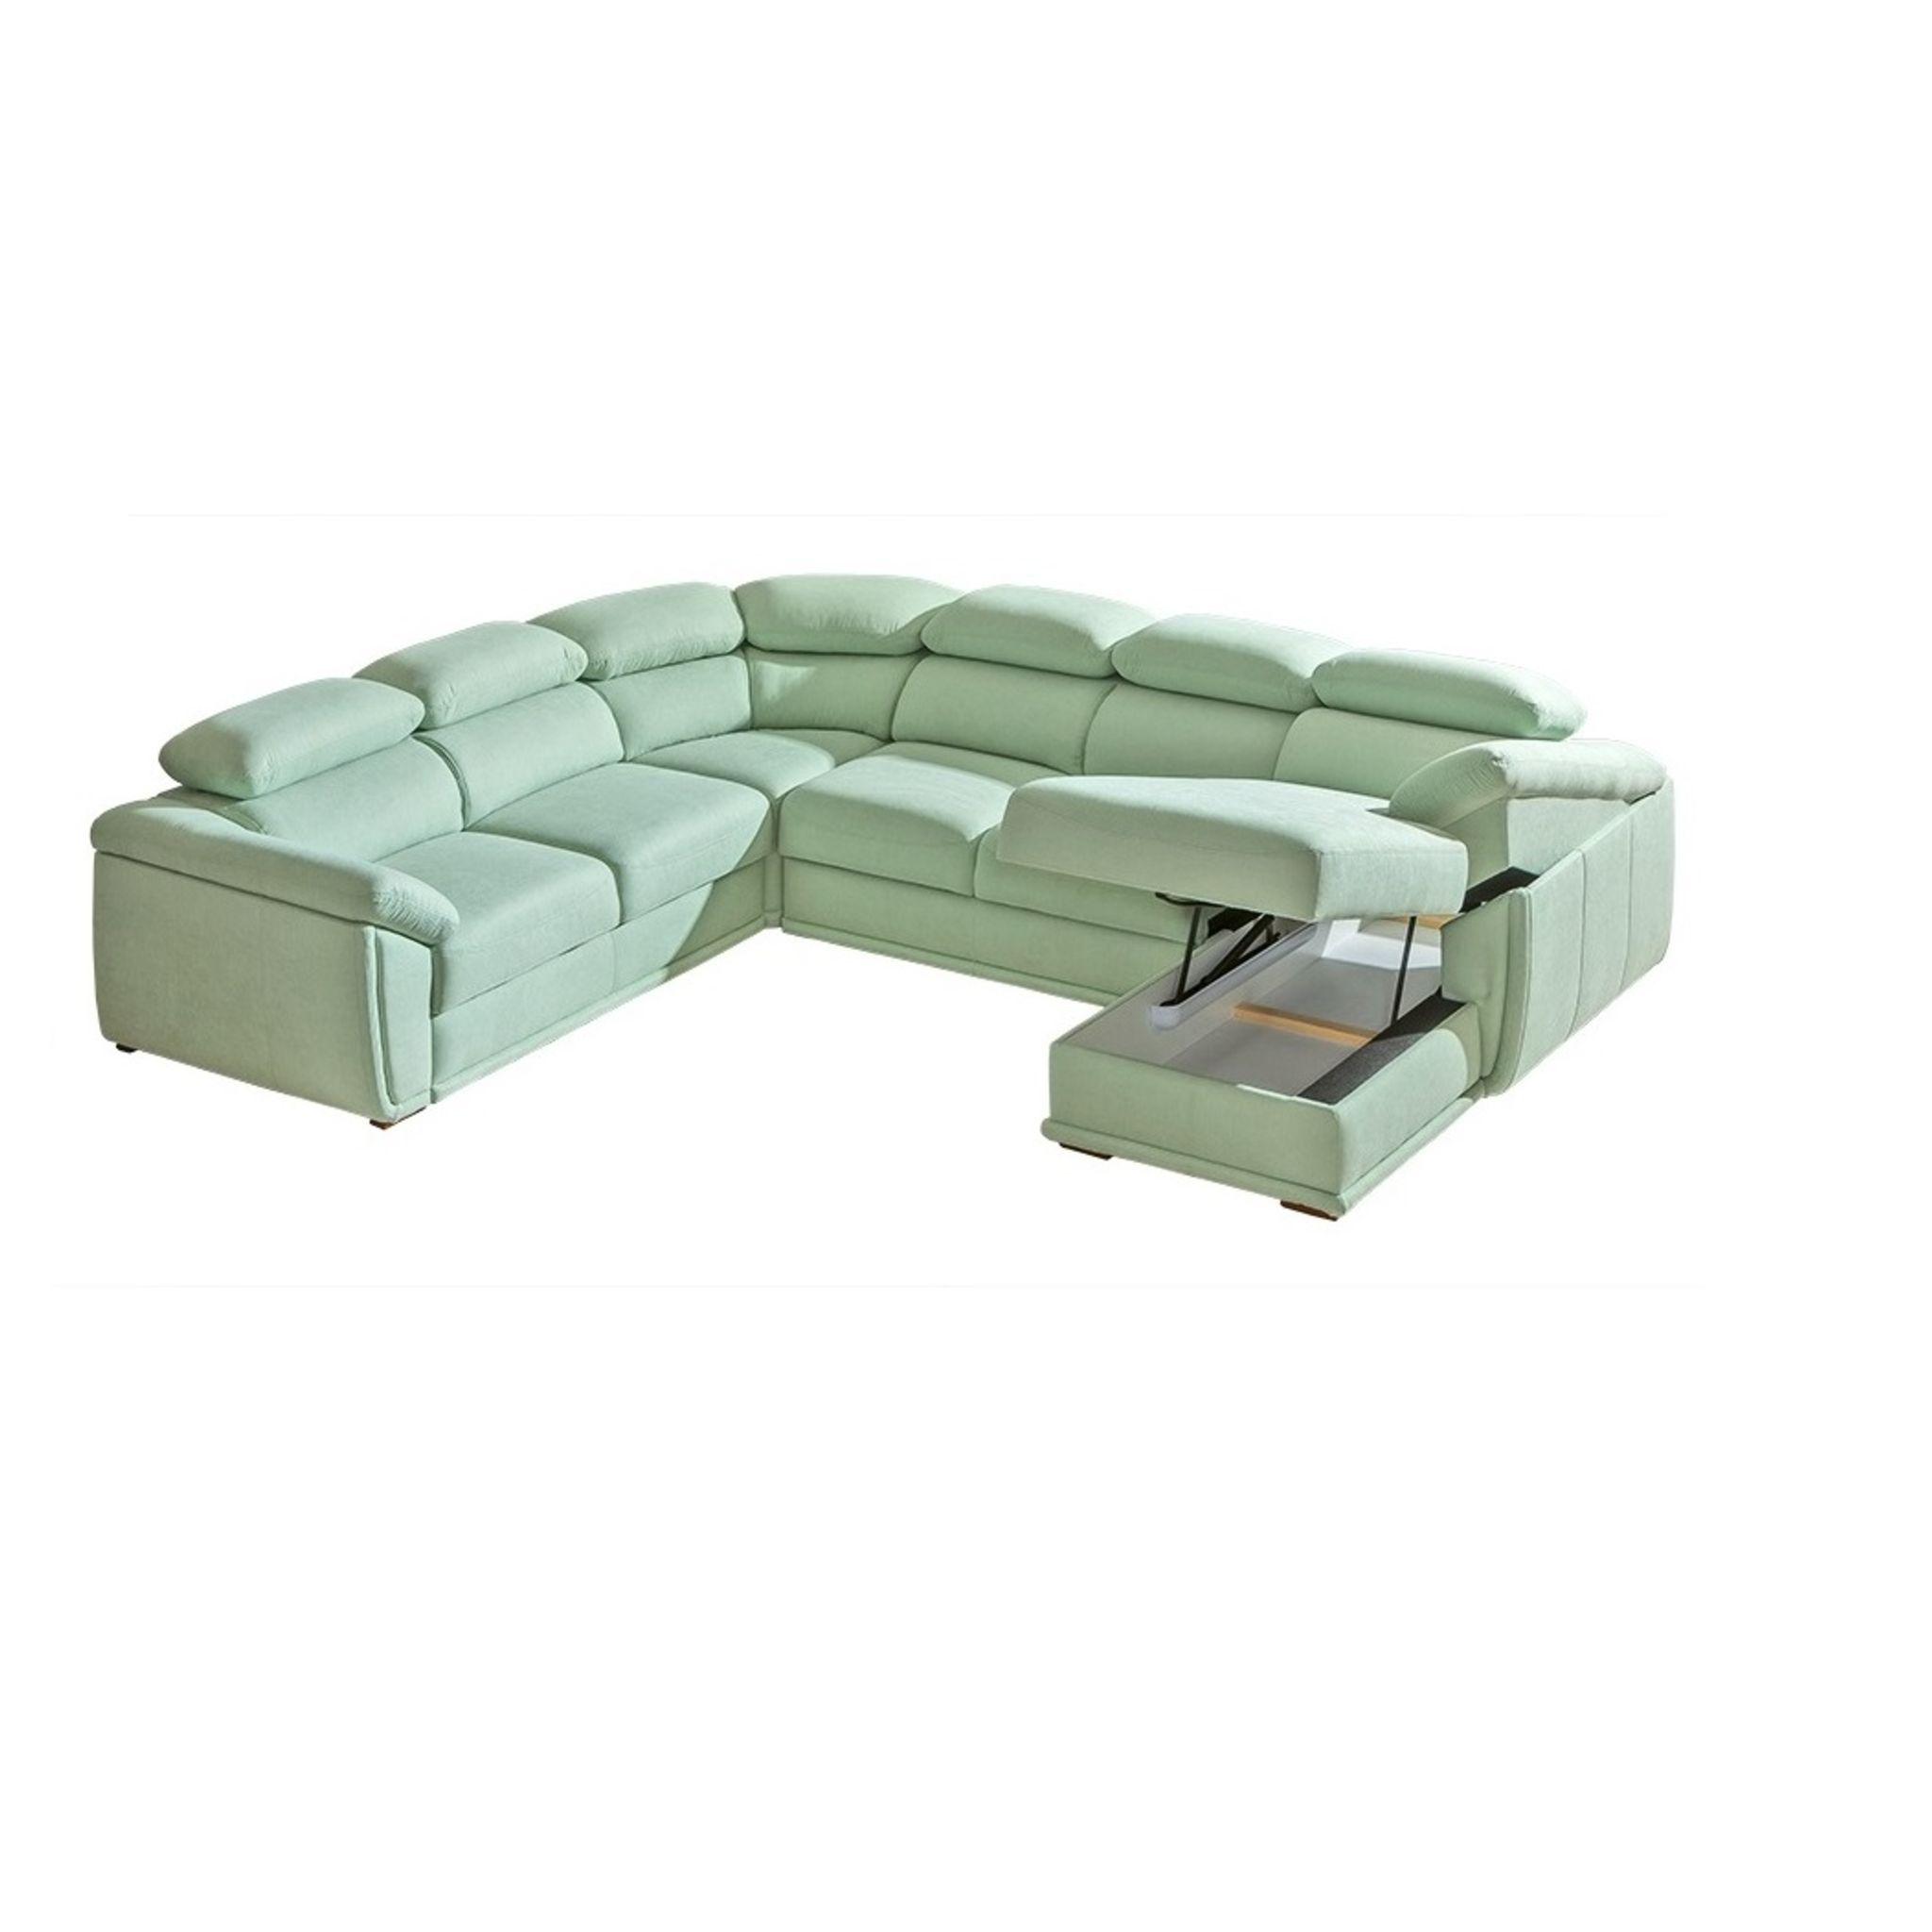 Eastwoods U Shape Modern Corner Sofa Bed Cadiz 3250mm X 2580mm Many Upholstery Materials Corner Sofa Bed Corner Sofa Sofa Bed